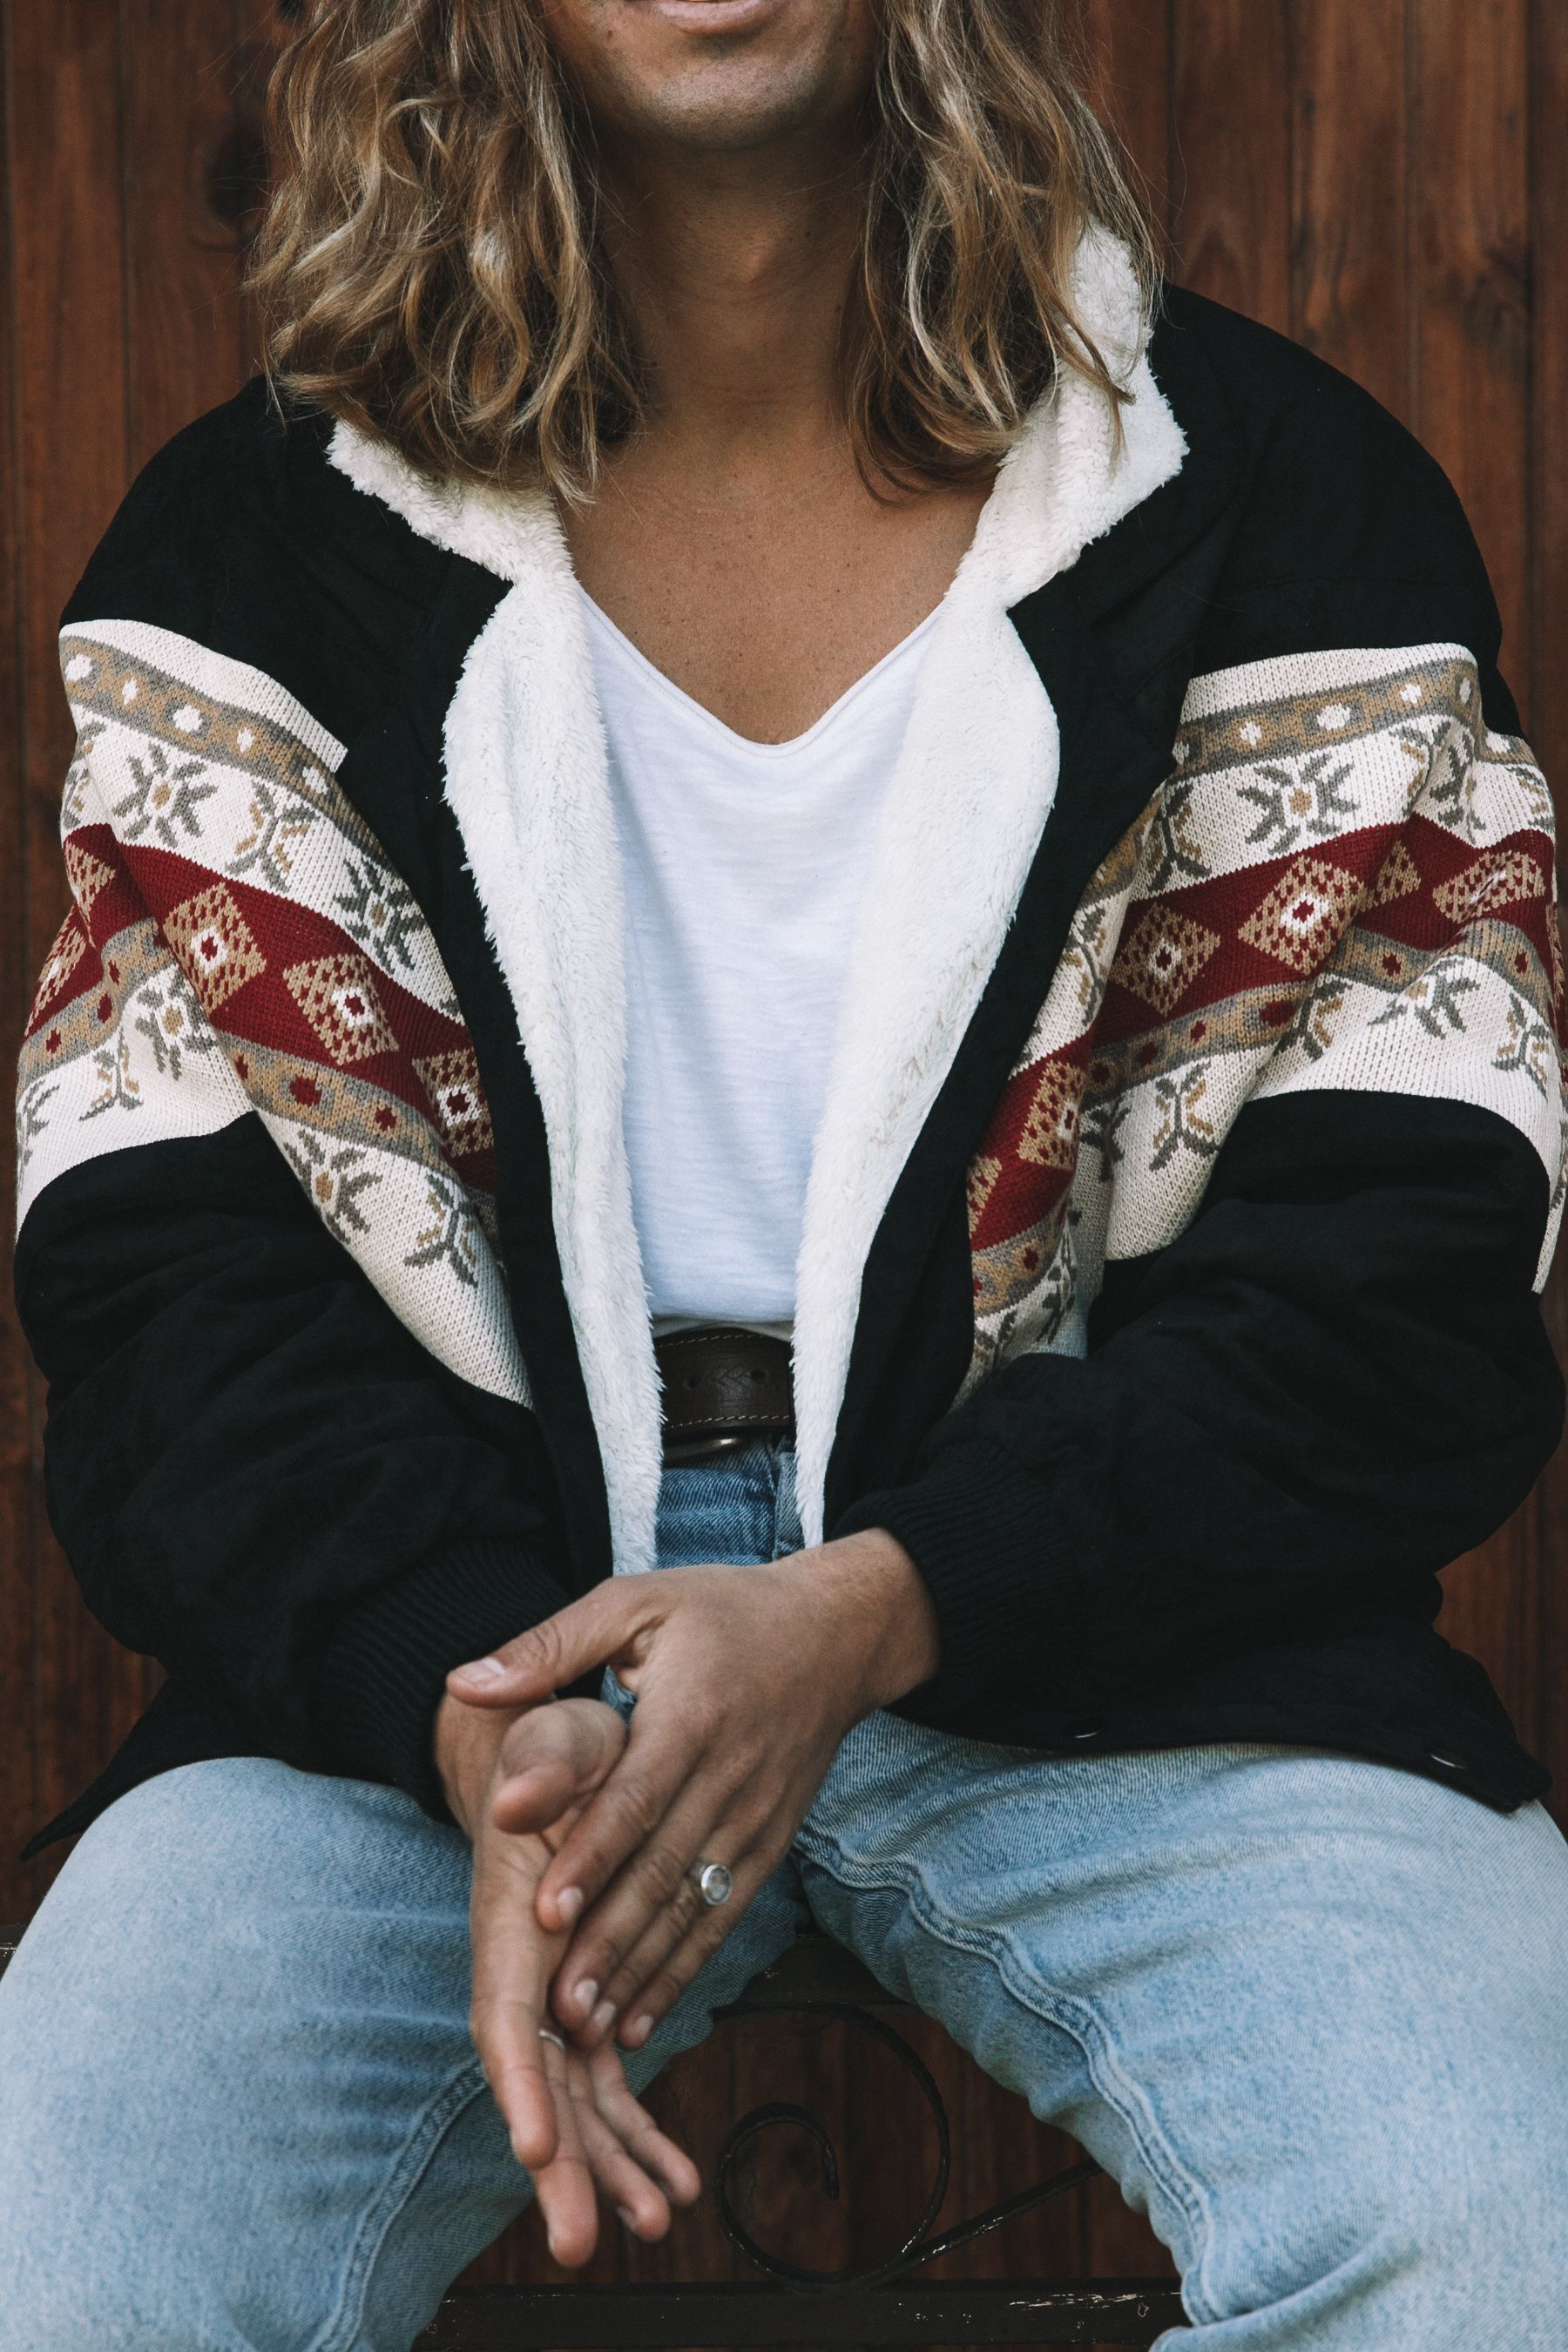 The Rarebird Jacket Ottway In 2021 Fashion Jackets Clothes [ 2700 x 1800 Pixel ]